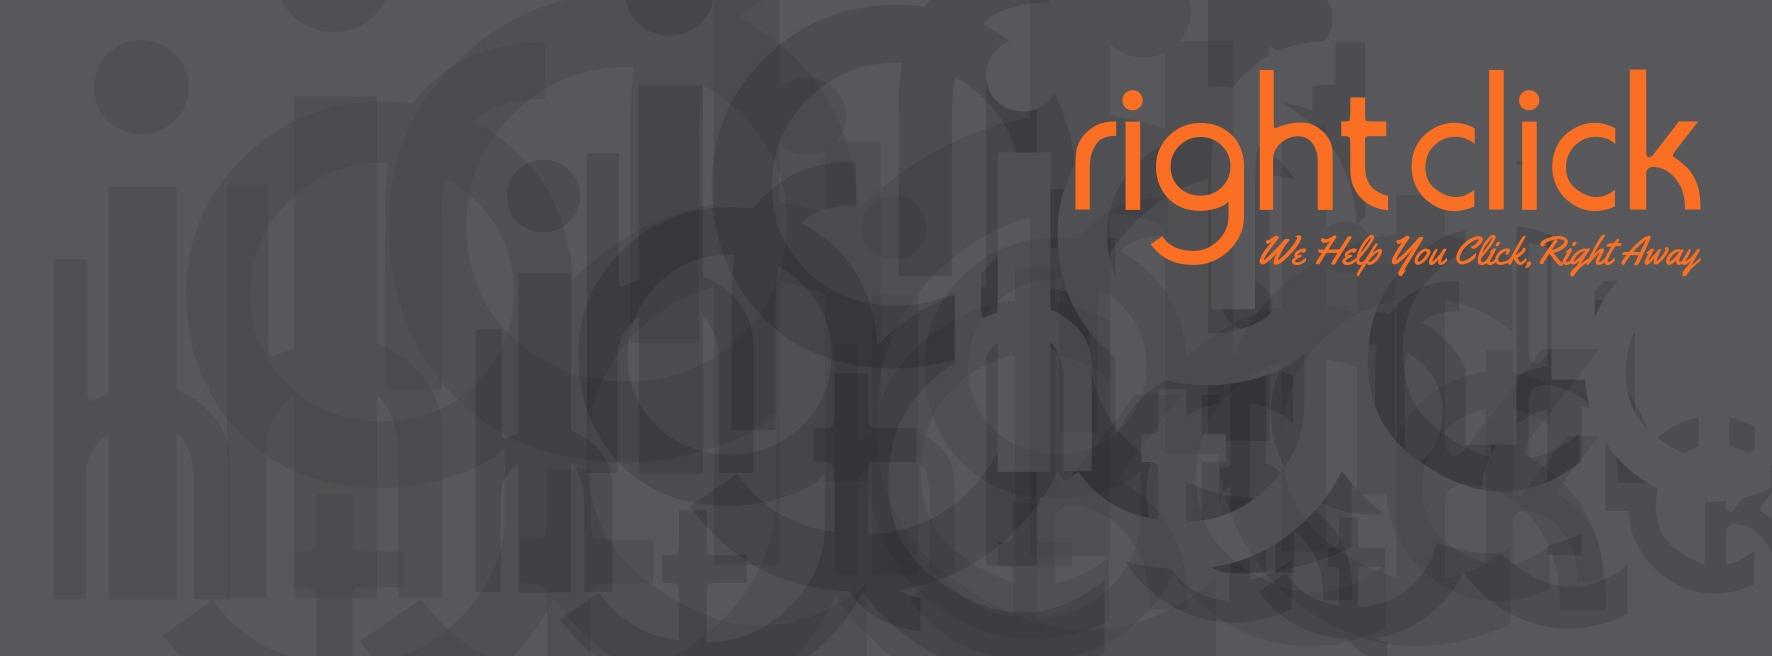 Right Click Digital Marketing  (@rightclickmarketing) Cover Image